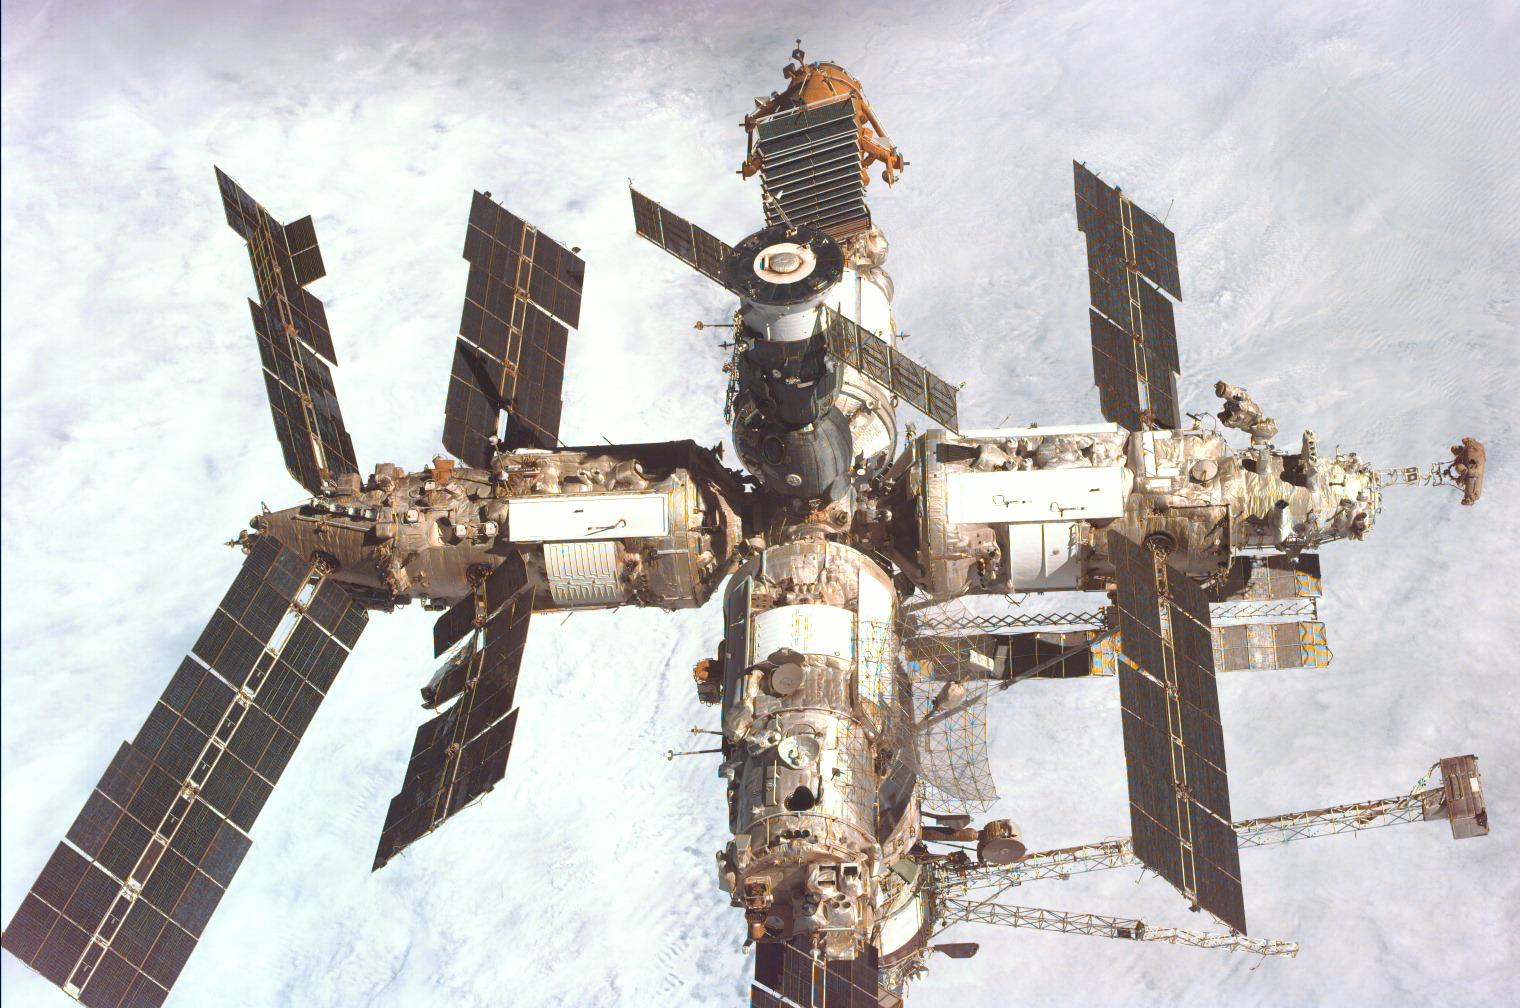 Mir Raumstation